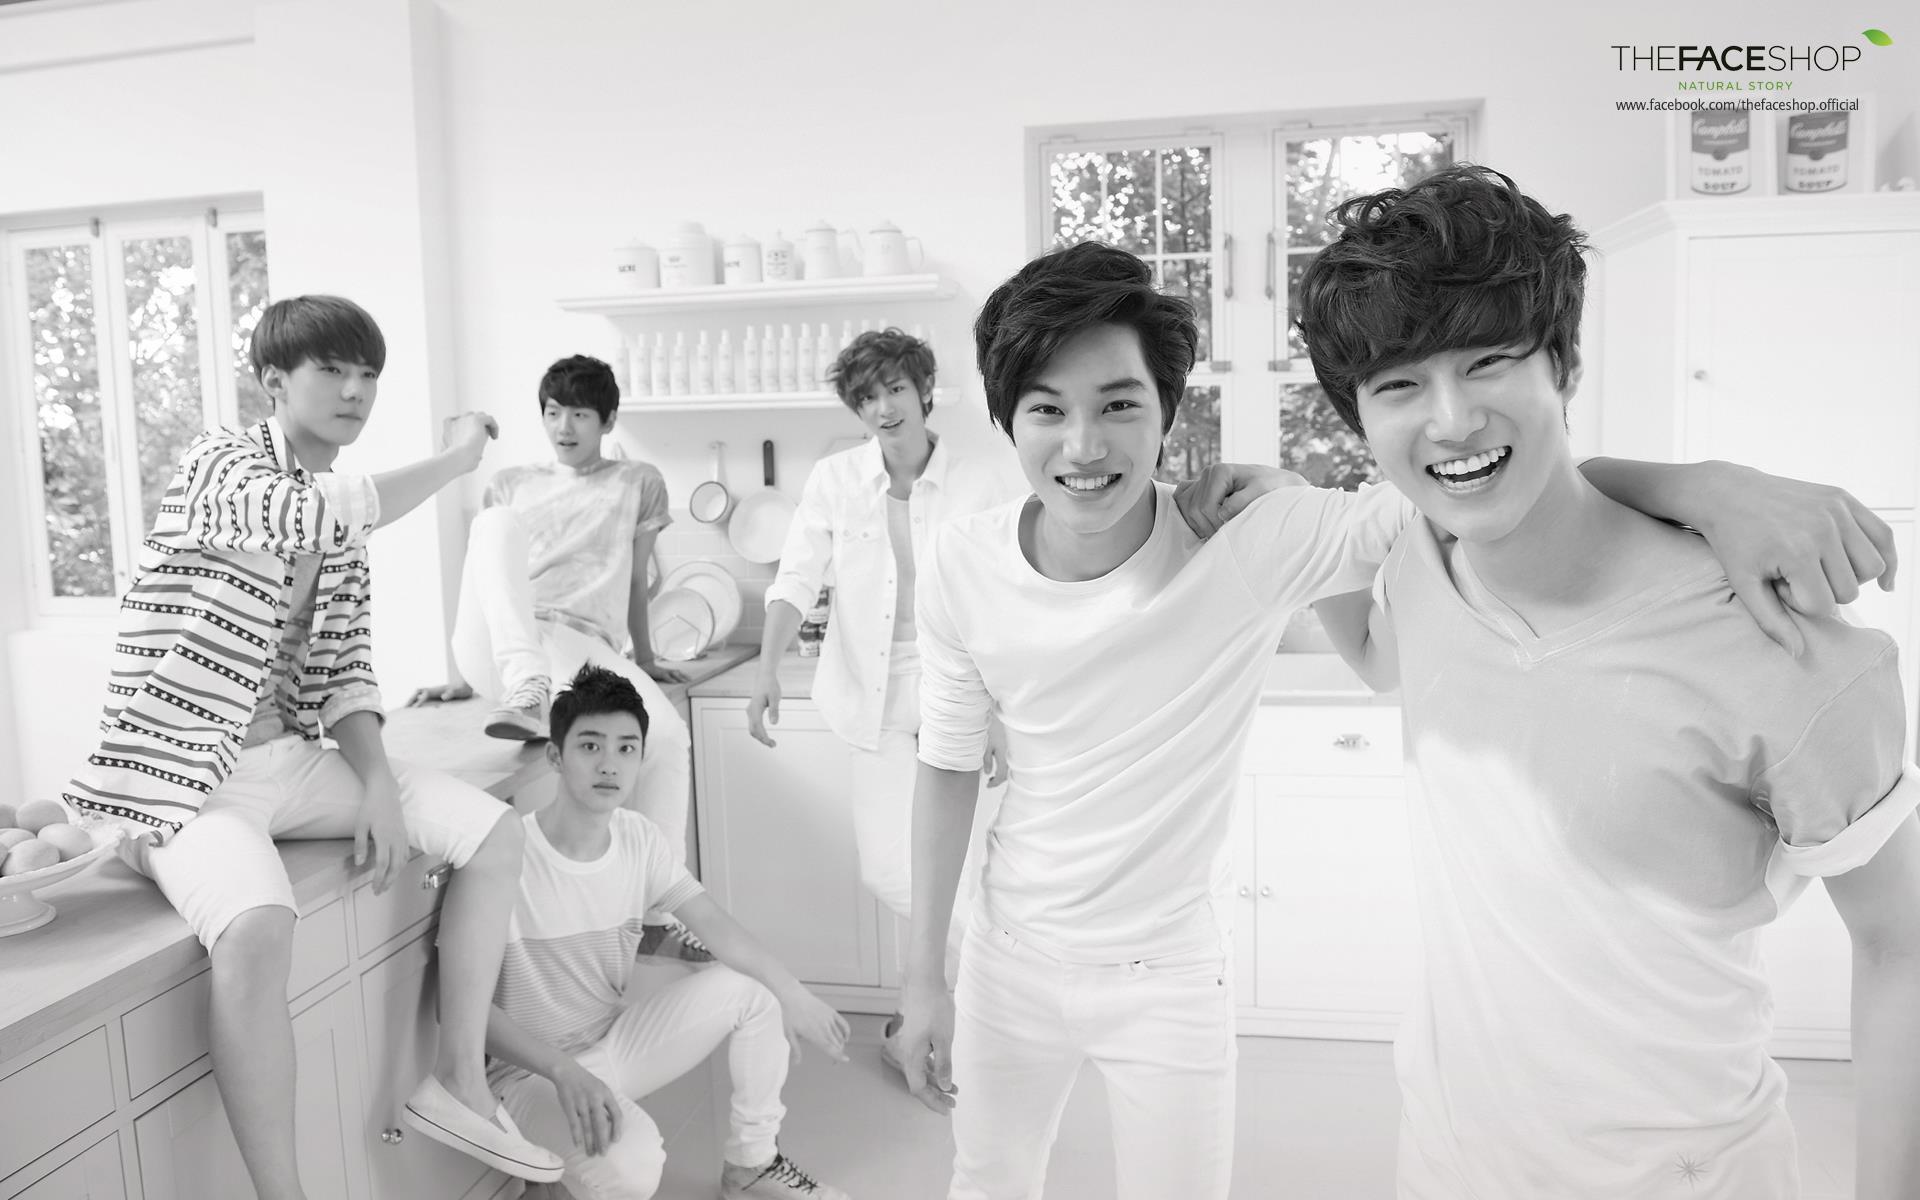 Exo Hd Wallpaper Exo Wallpaper Face Shop 304783 Hd